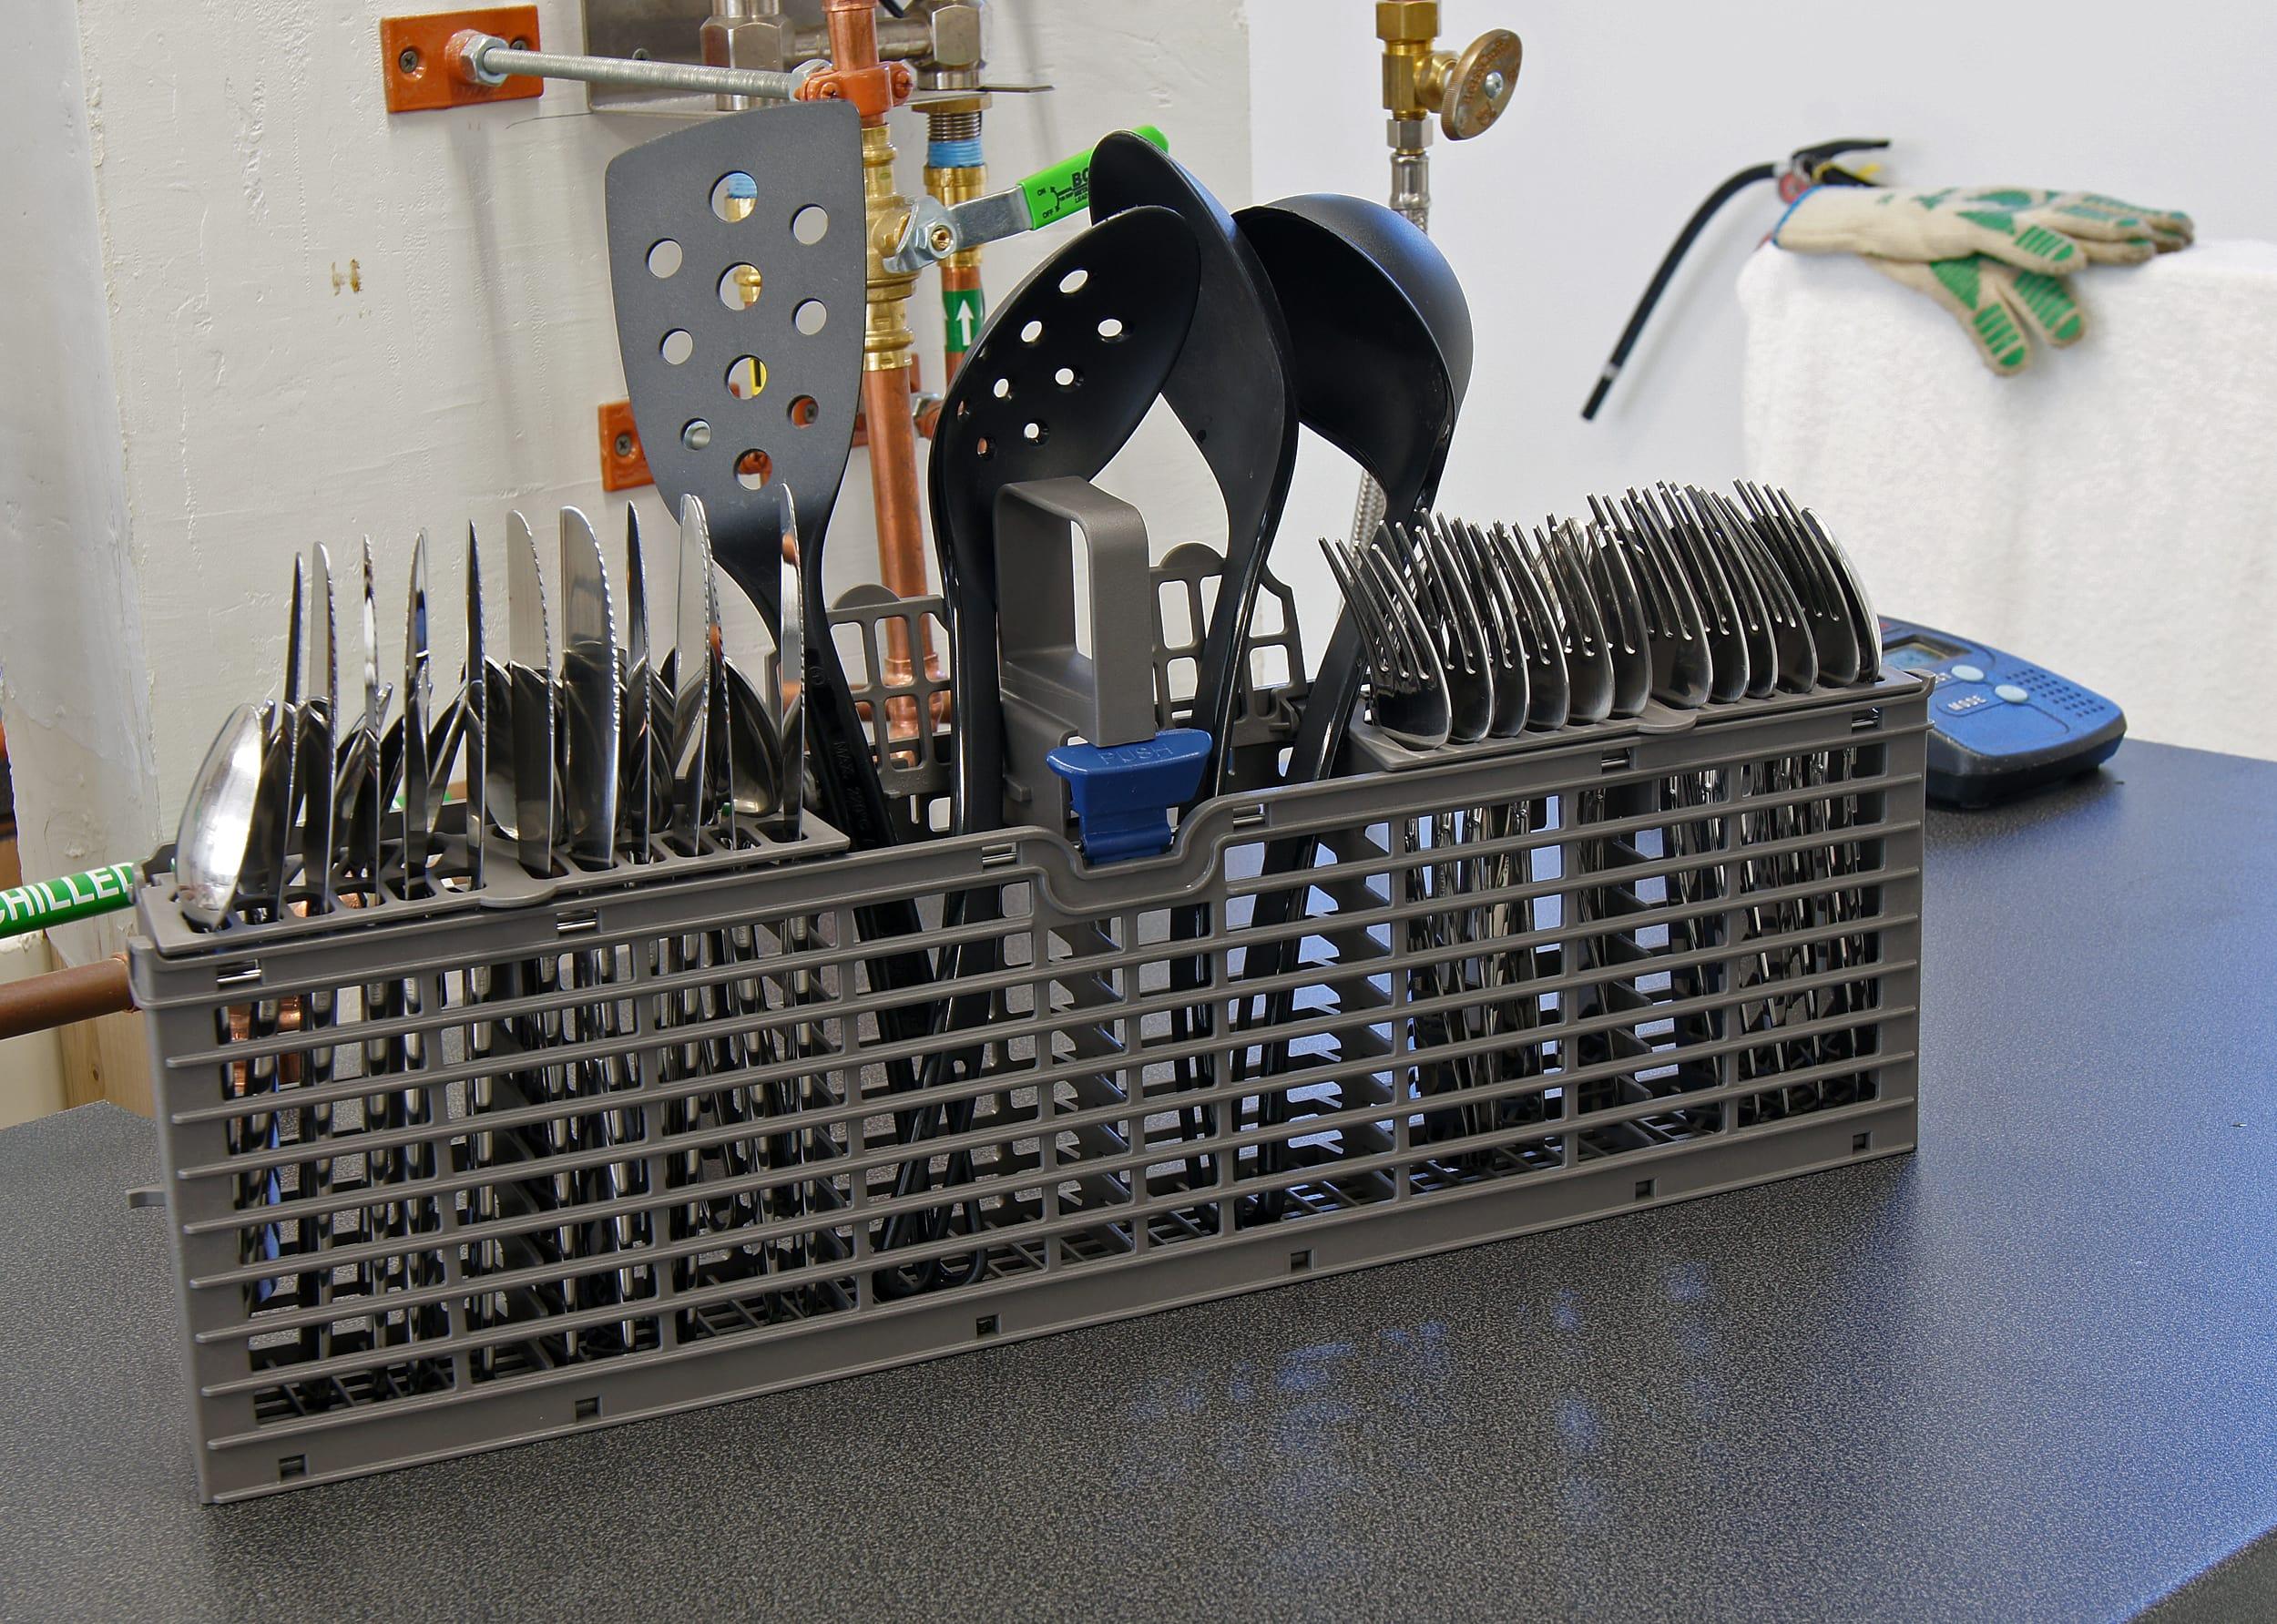 Whirlpool WDT920SADM cutlery capacity